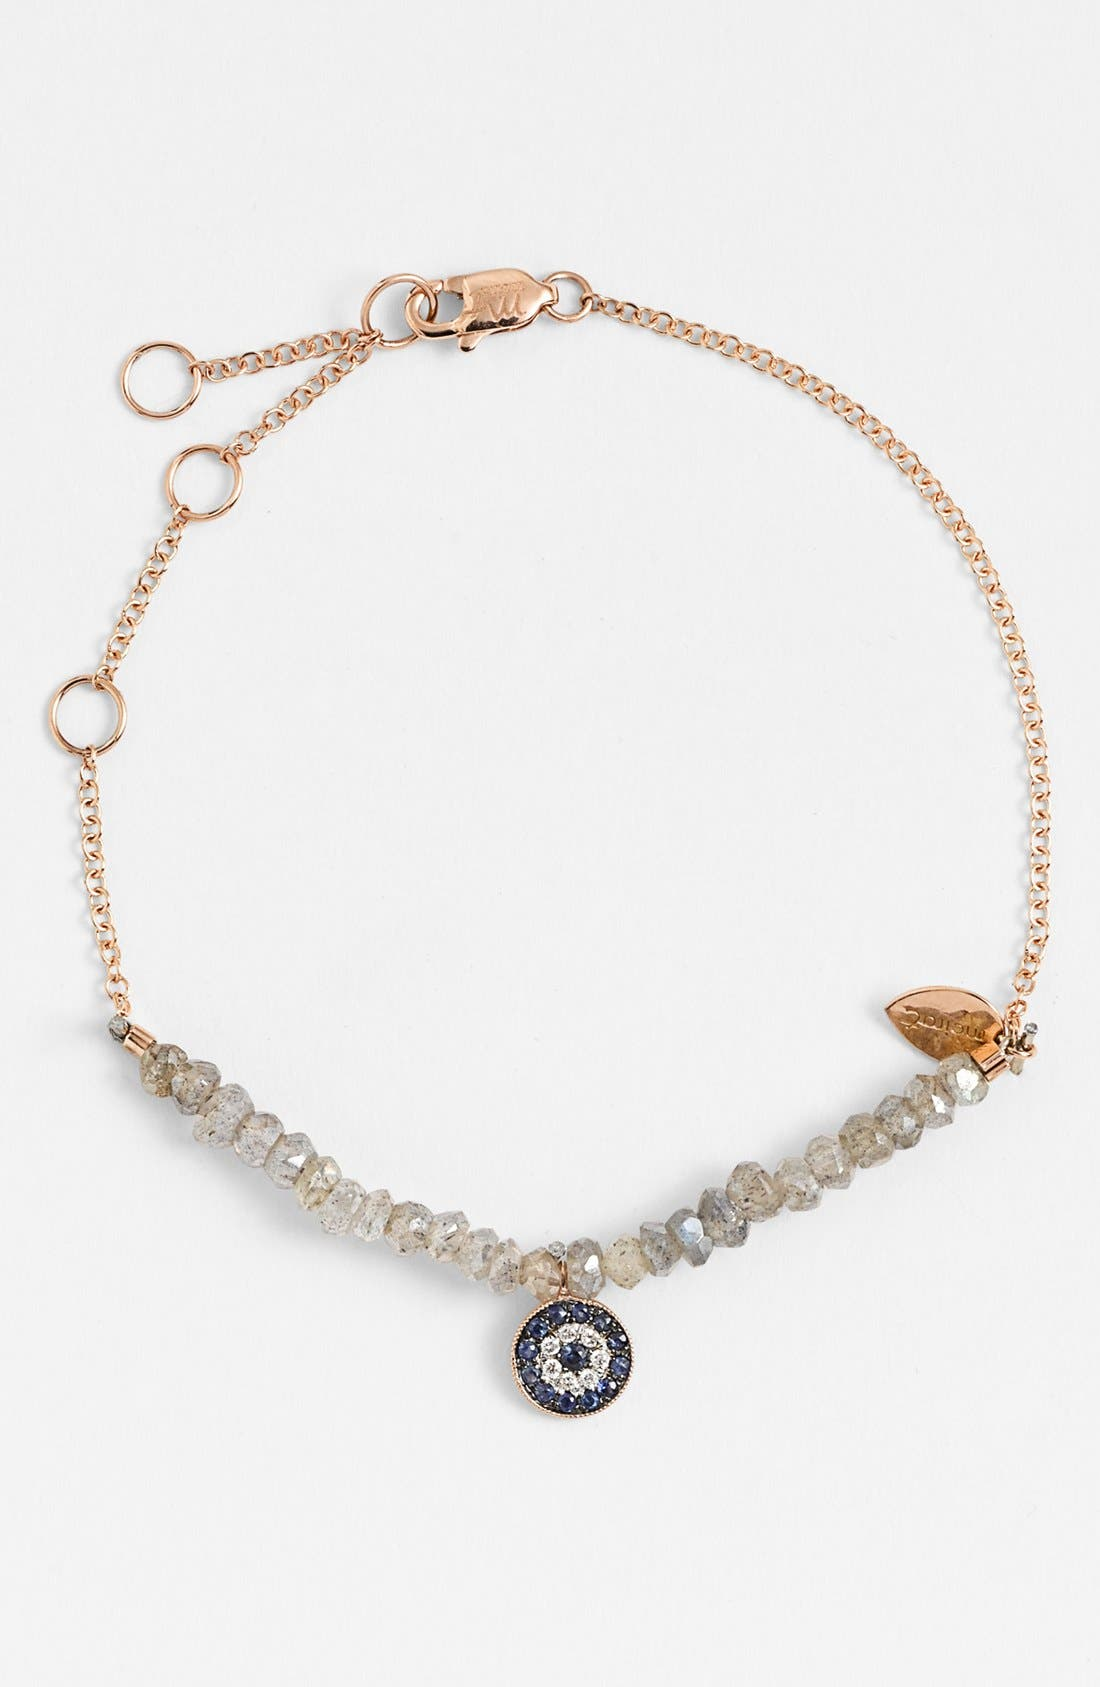 Main Image - MeiraT 'Desert Infusion' Diamond, Sapphire & Stone Bracelet